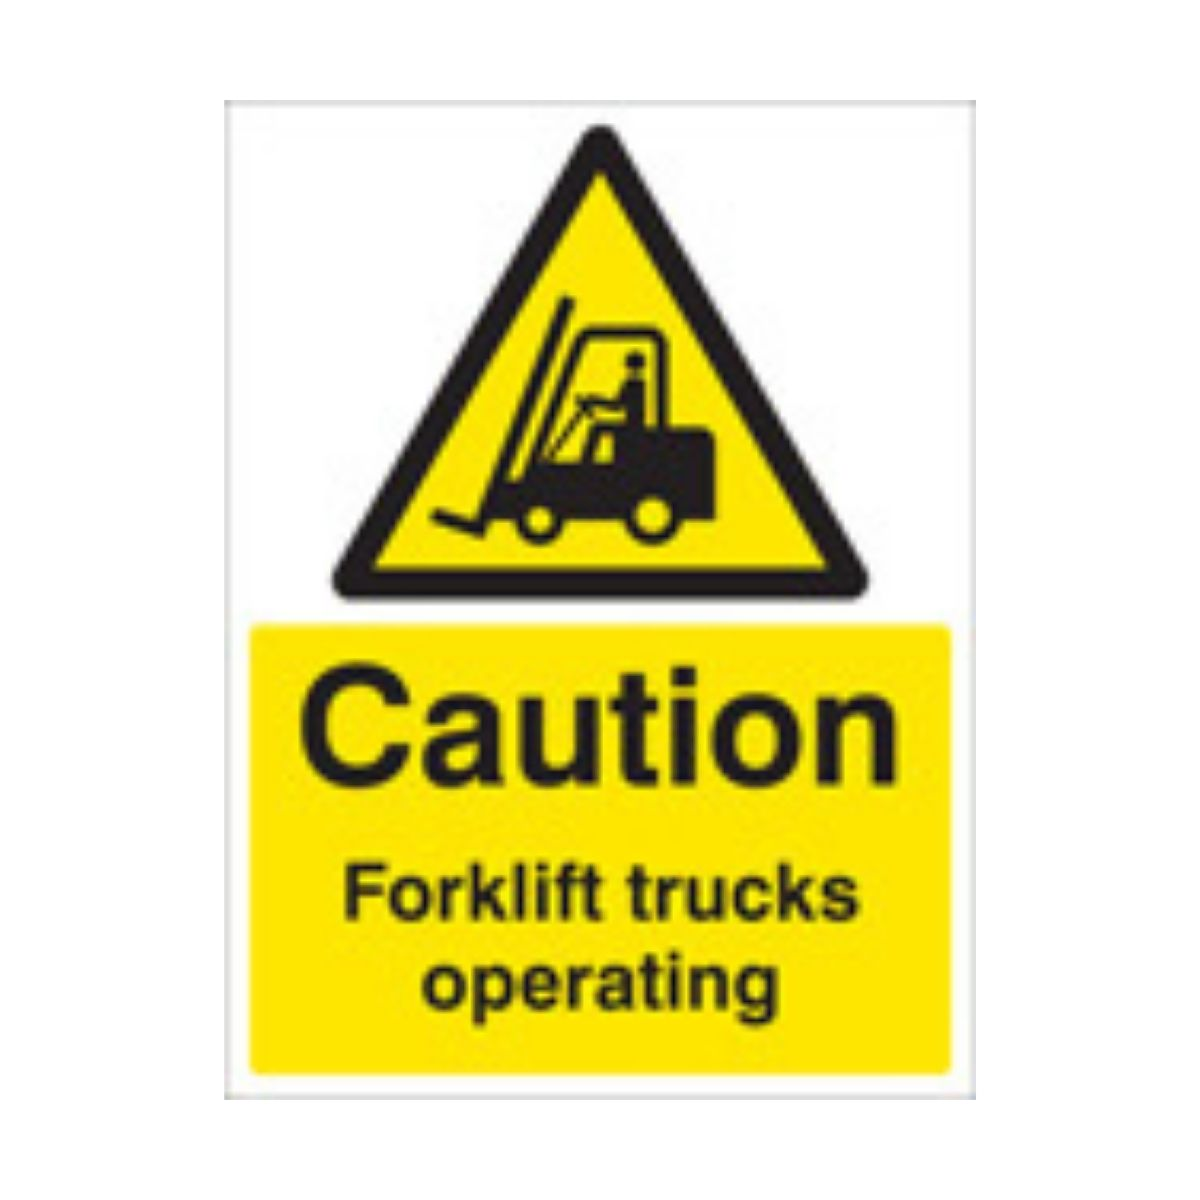 SS14215K Caution Forklift Trucks Operating (400 x 300mm)